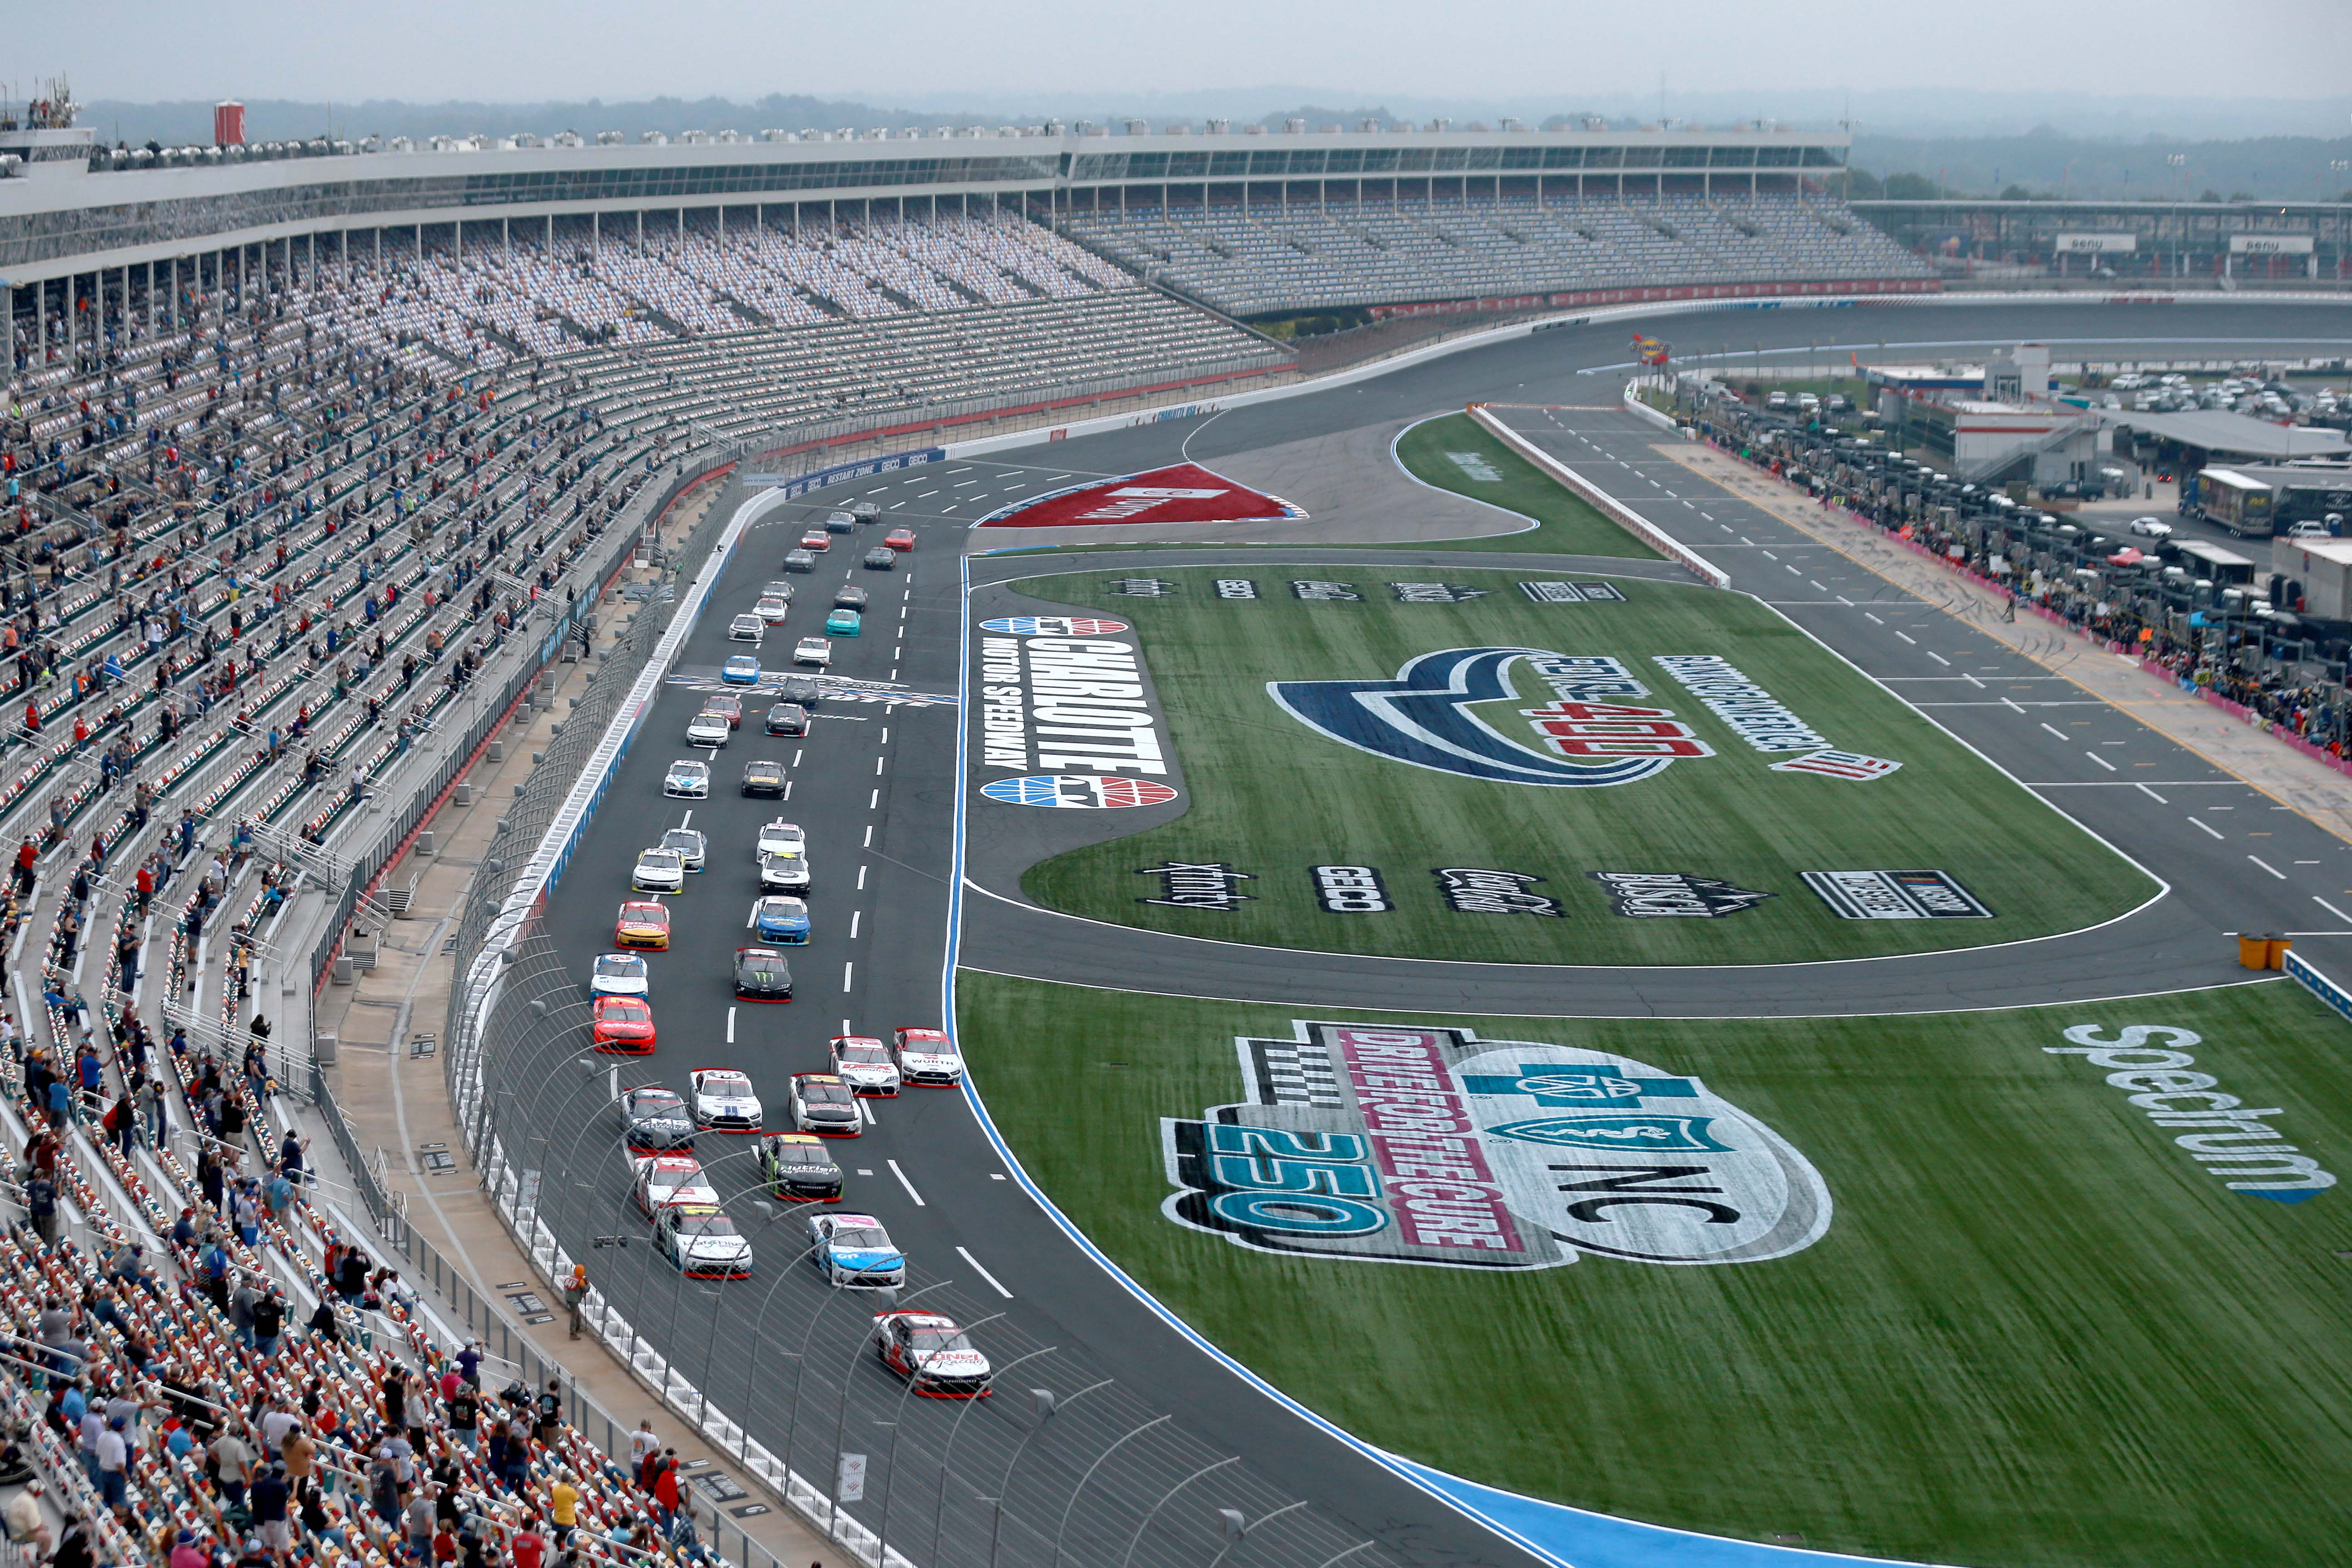 NASCAR Xfinity Series on the Charlotte Roval